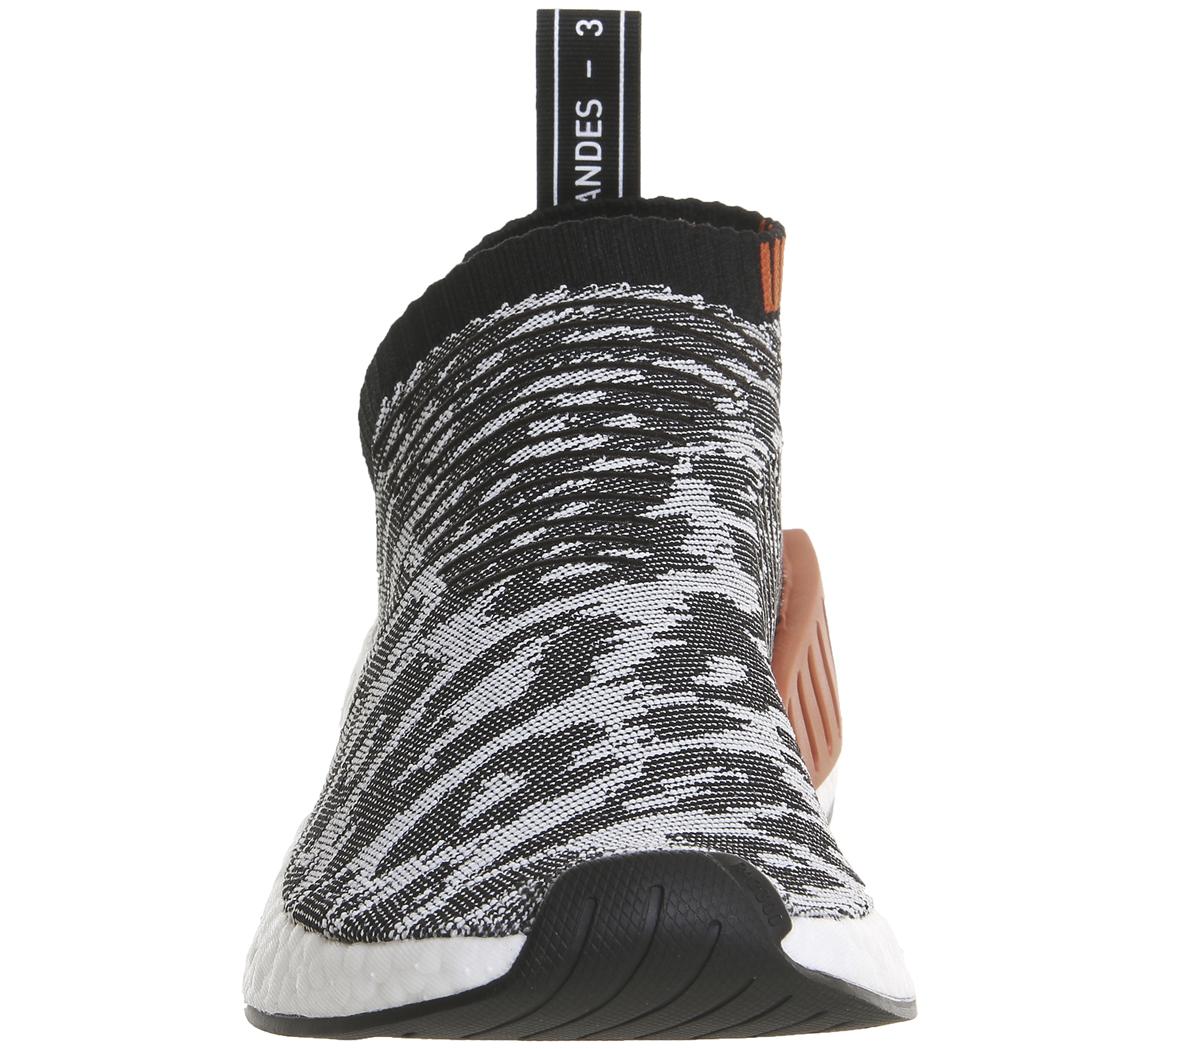 online store 43d5b d19ef Adidas-Nmd-City-Sock-2-BLACK-FUTURE-HARVEST-